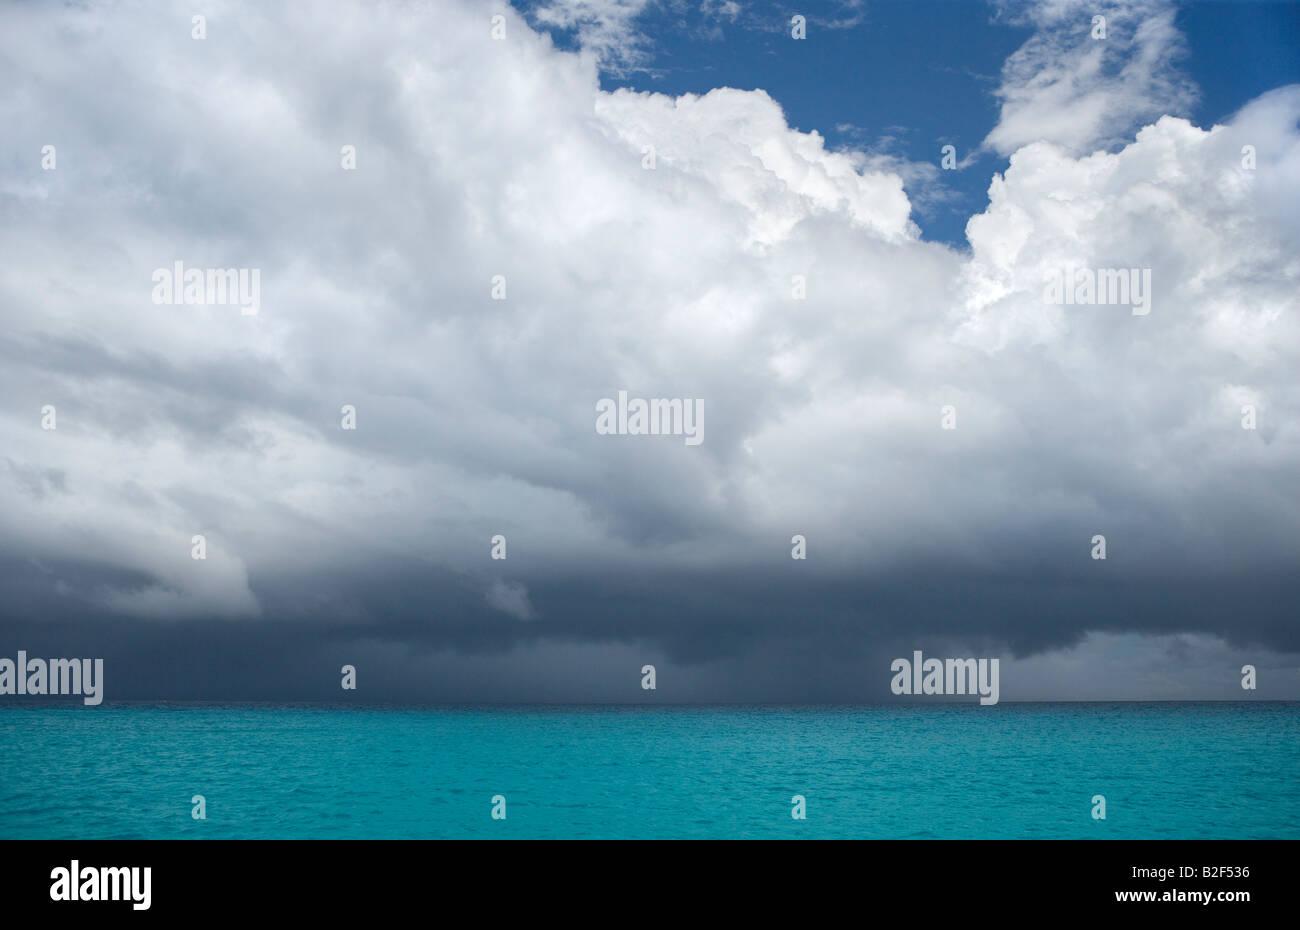 Dark rain clouds forming over the Caribbean Sea near St Martin in the Leeward Islands - Stock Image